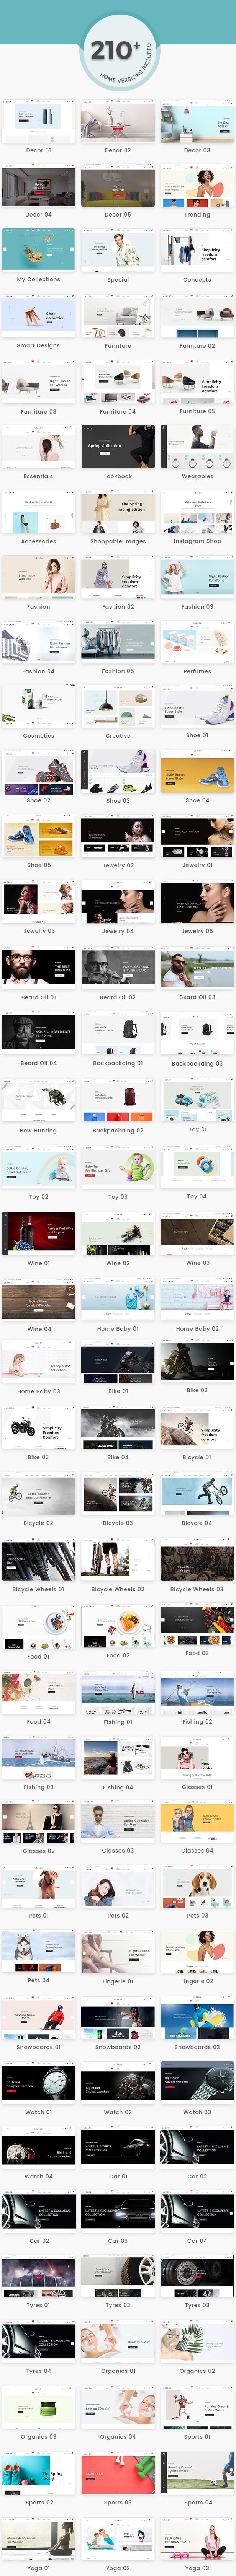 Lezada - Multipurpose Shopify Theme - 5